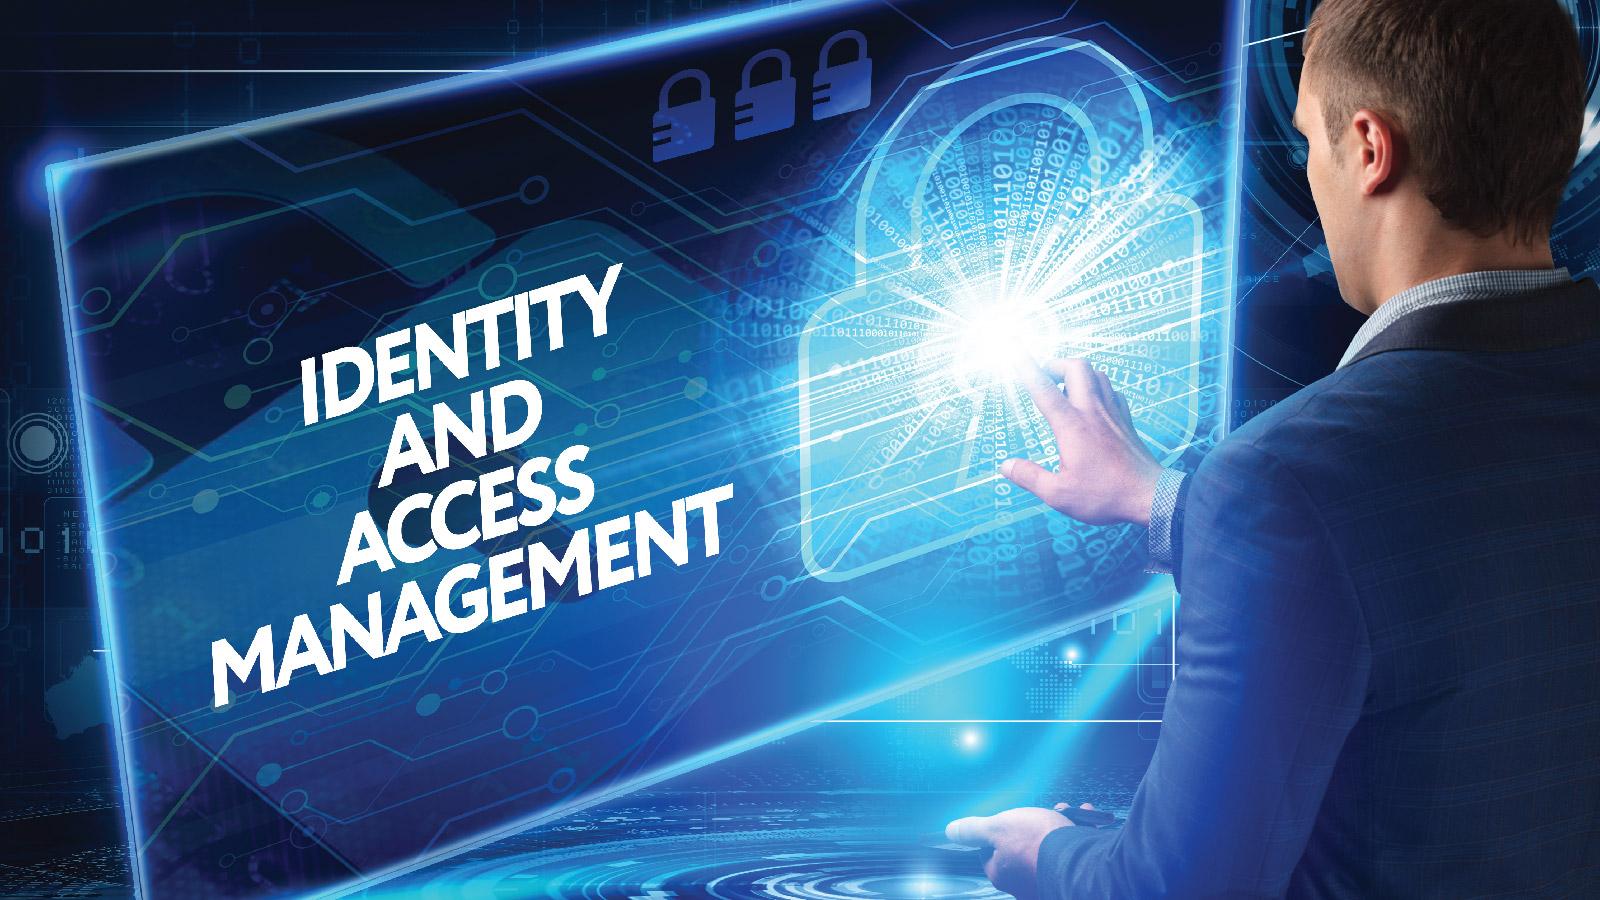 Identity management, Cyber Security, Siri, Security Breach, Automation, Dark Web, eBay, Hotmail, Yahoo, Google, 2020, CEO, CMO, Identity management, Cyber Security